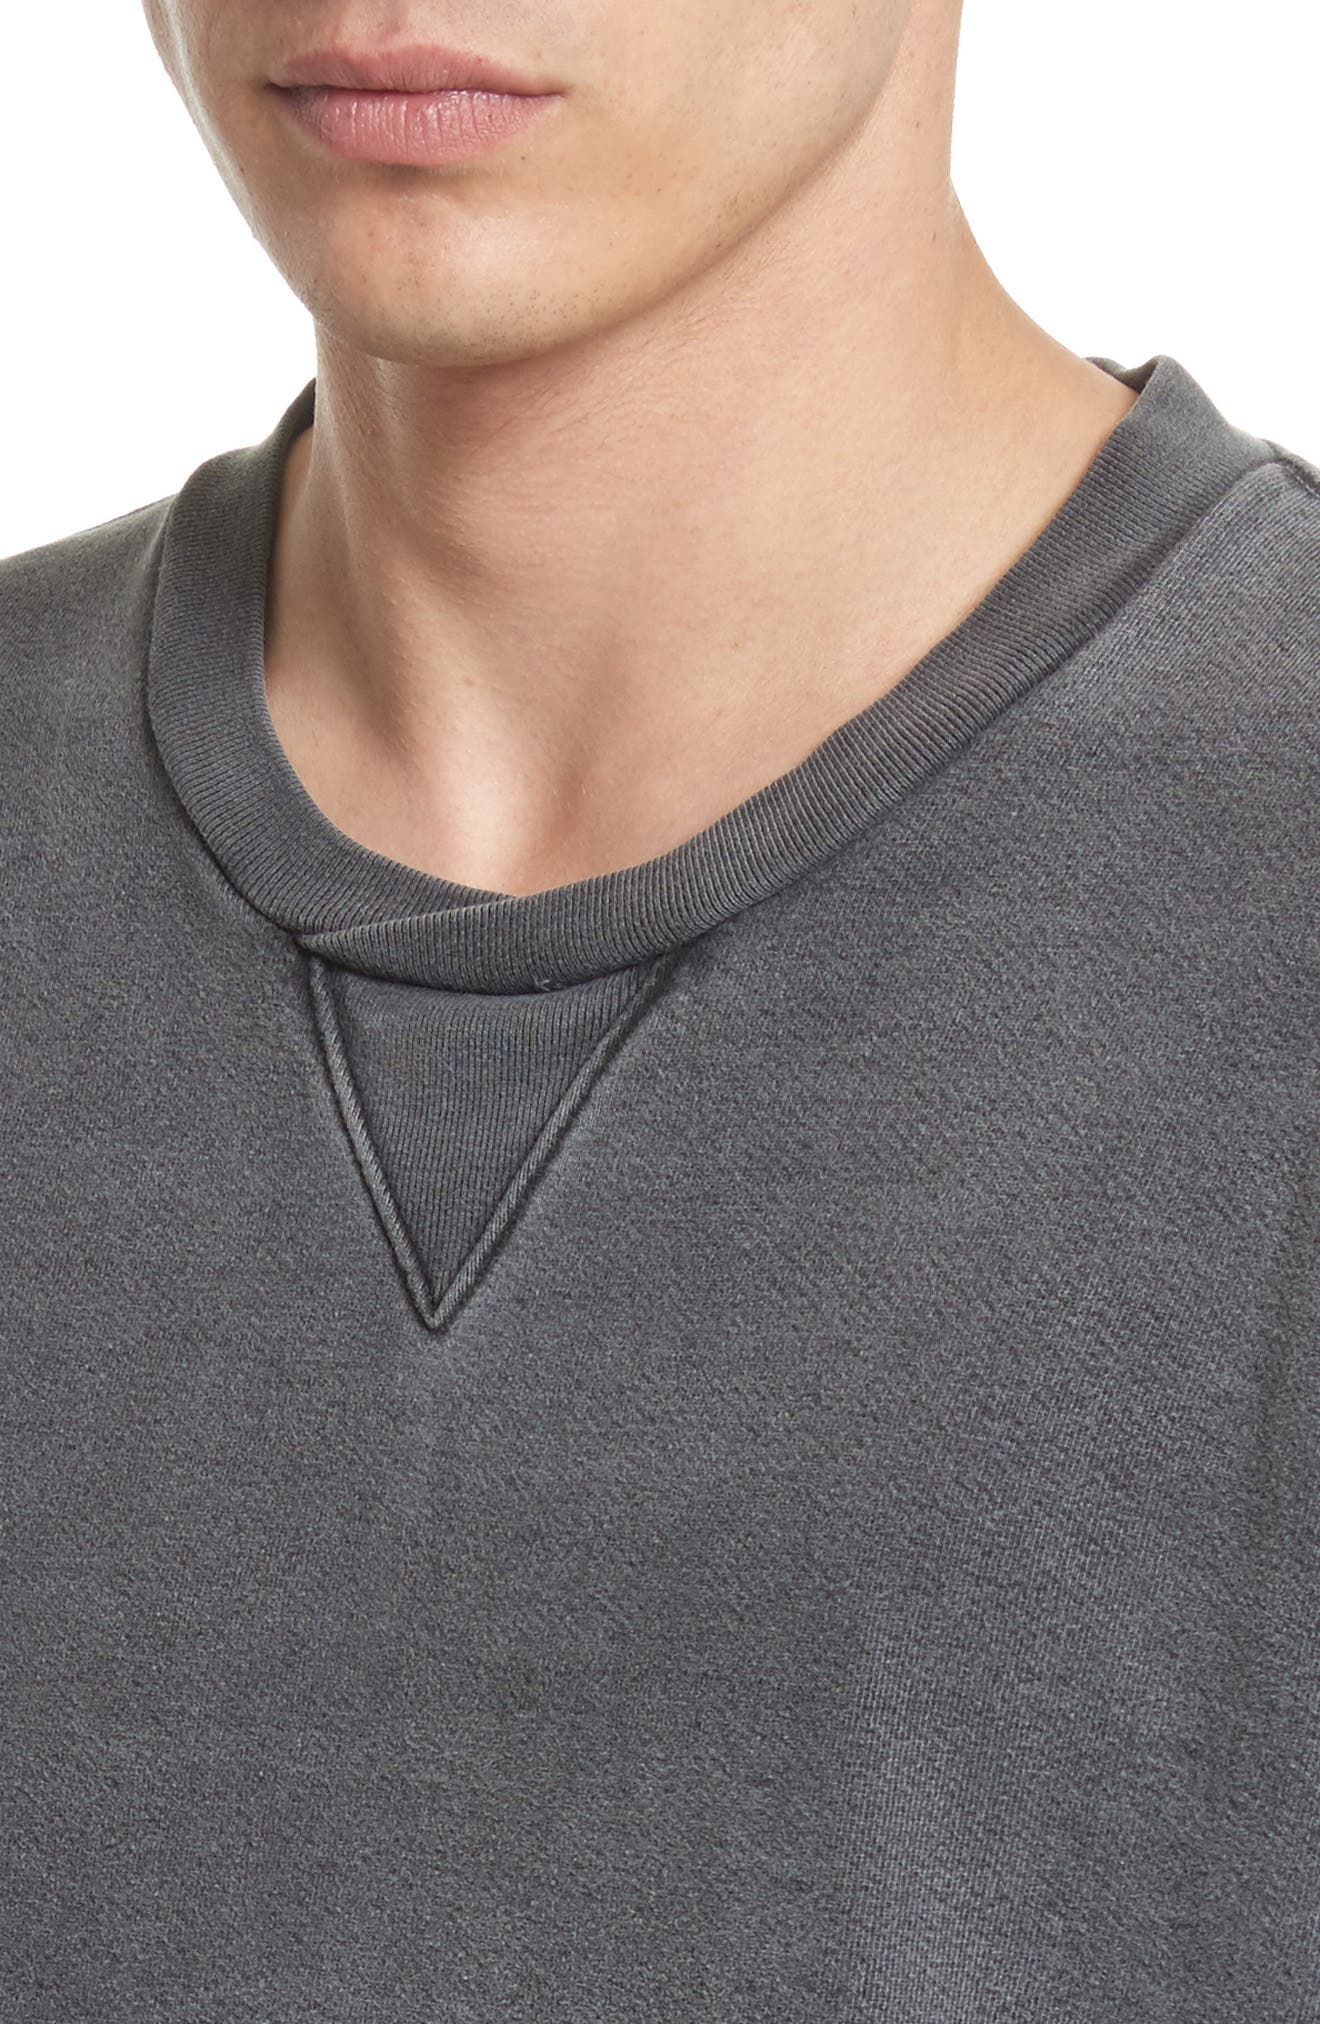 Norton Sweatshirt,                             Alternate thumbnail 4, color,                             Black Pigment